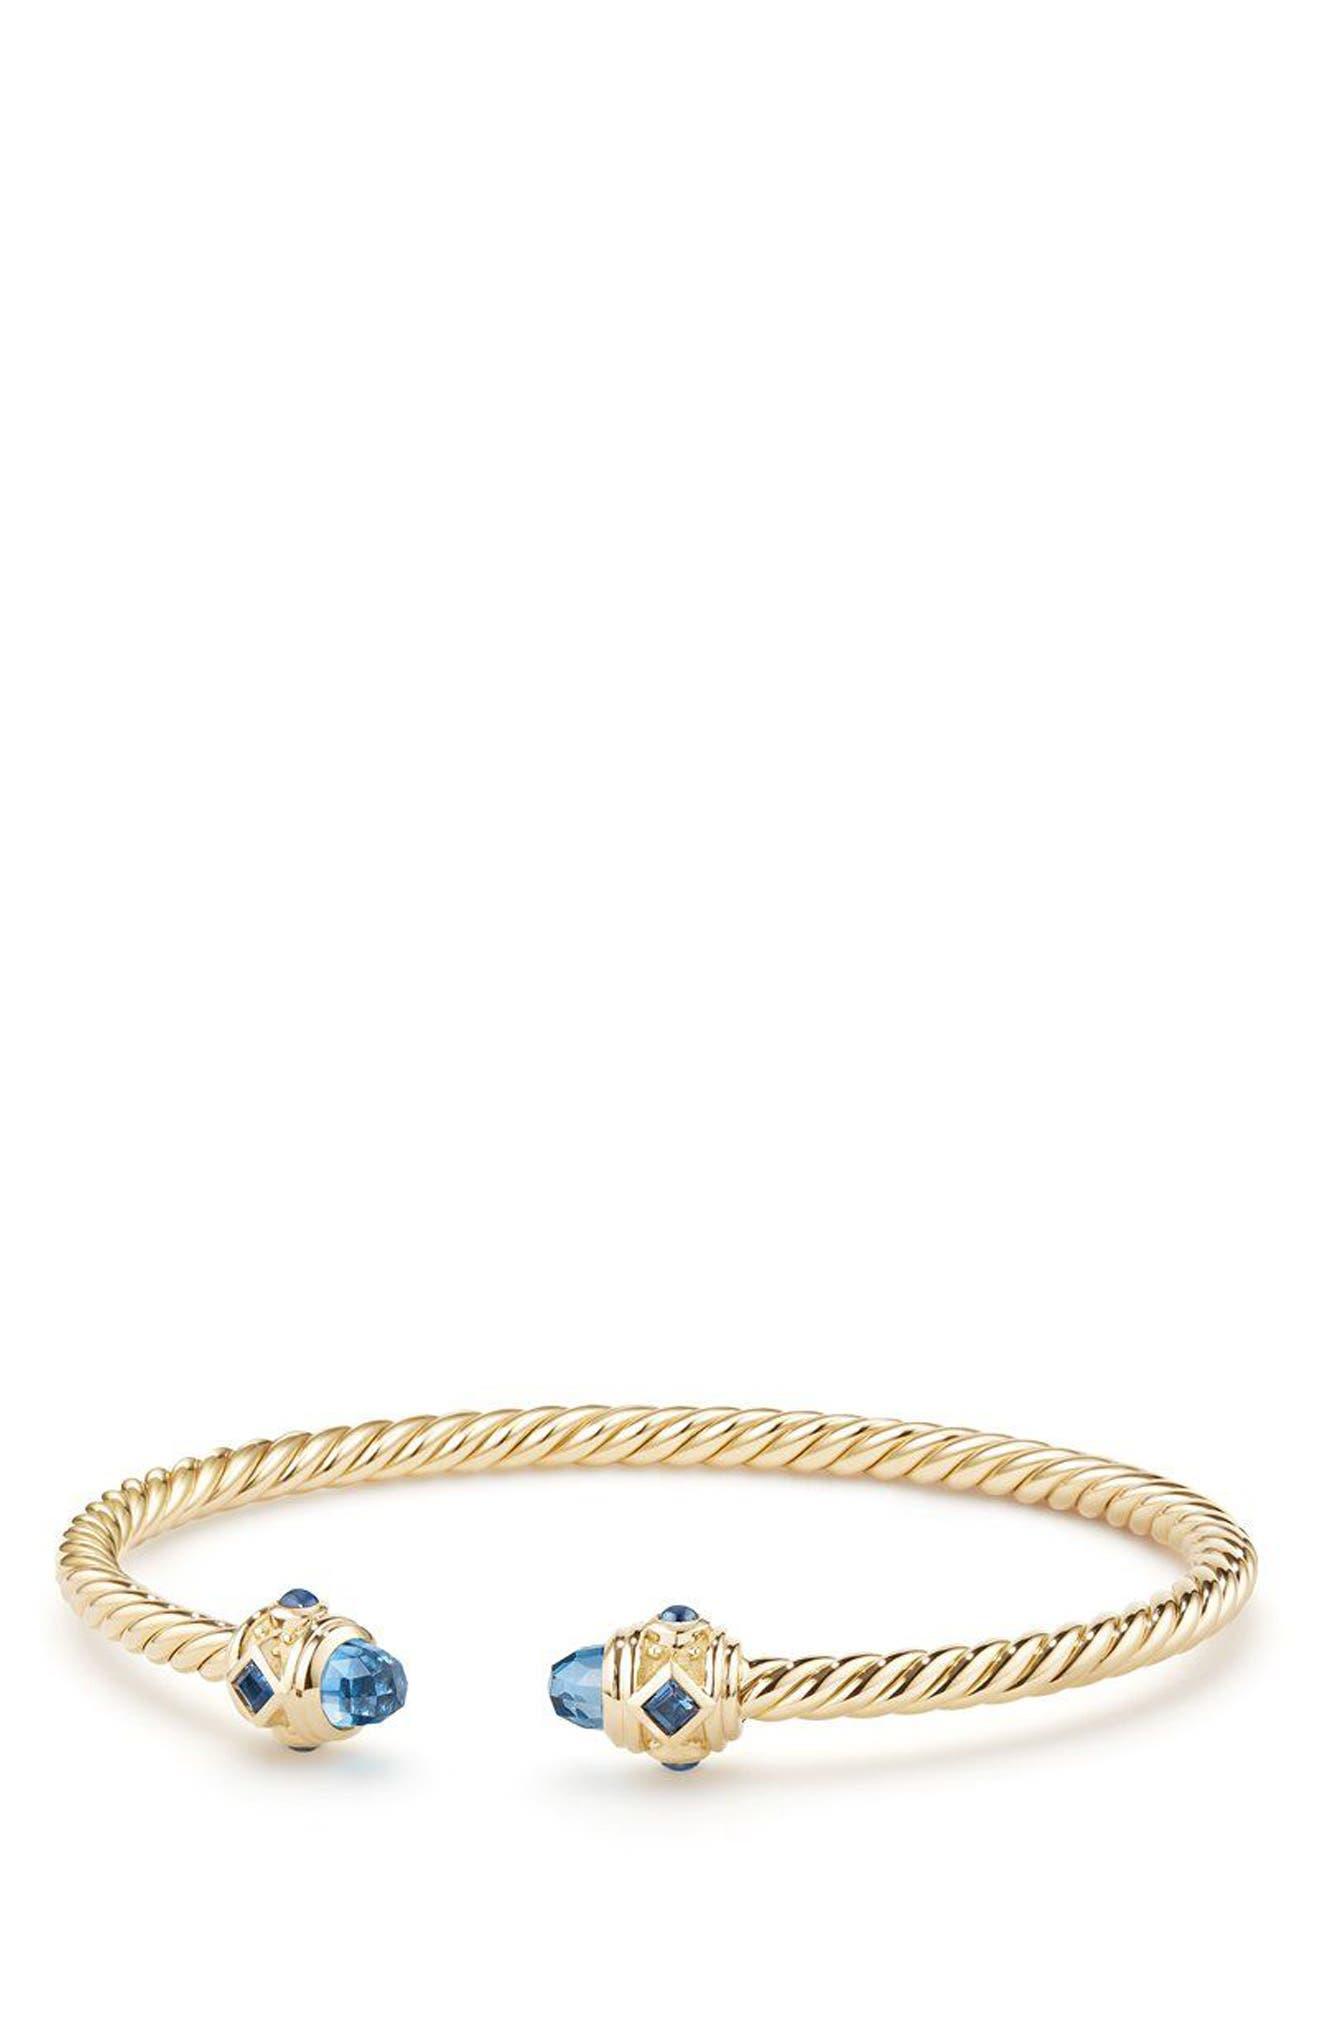 Renaissance Bracelet in 18K Gold, 3.5mm,                             Main thumbnail 1, color,                             GOLD/ HAMPTON BLUE TOPAZ